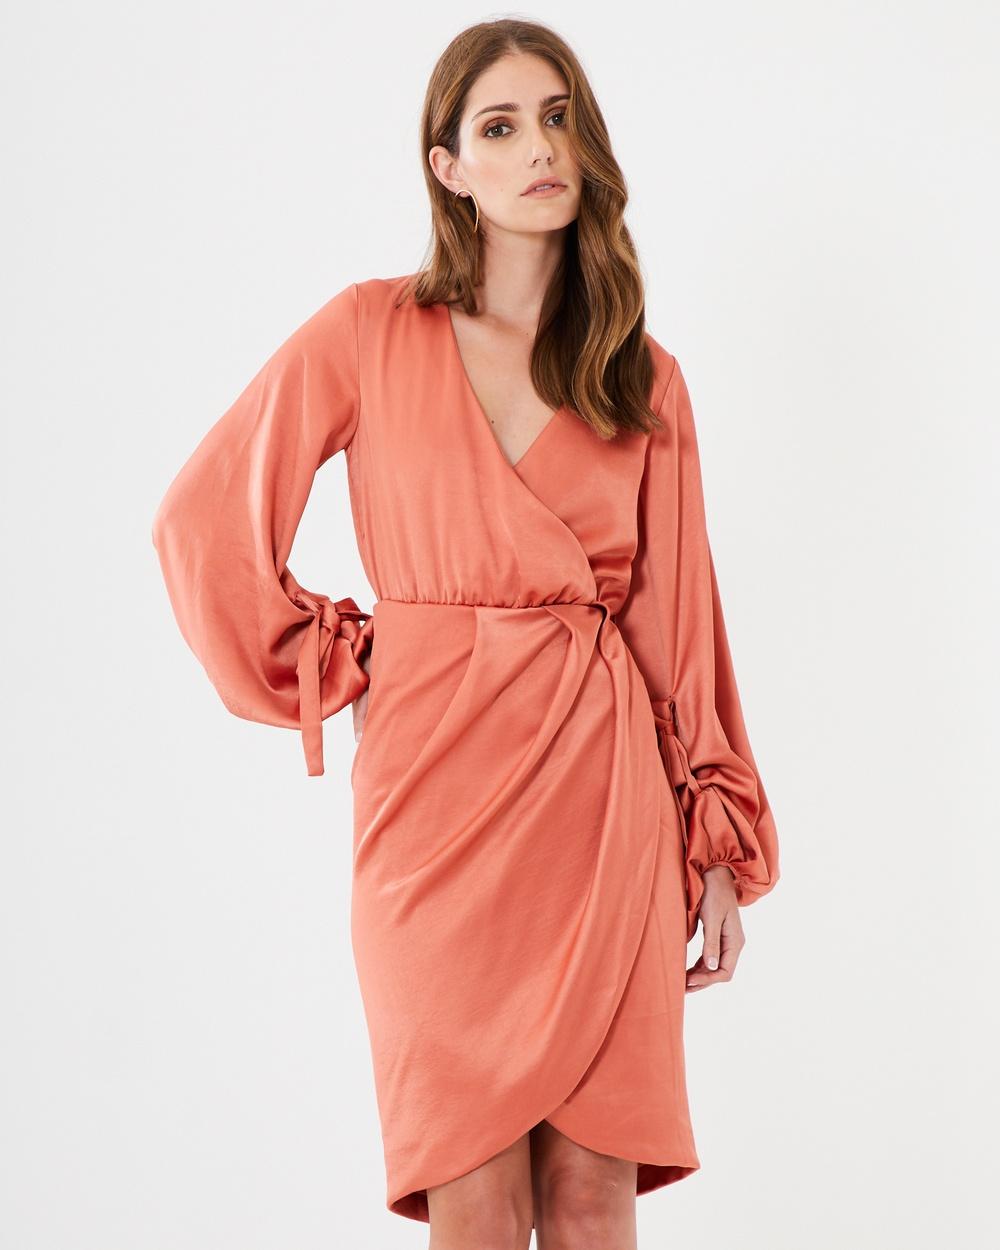 CHANCERY Cheryl Bell Sleeve Midi Dress Dresses Terracotta Cheryl Bell Sleeve Midi Dress